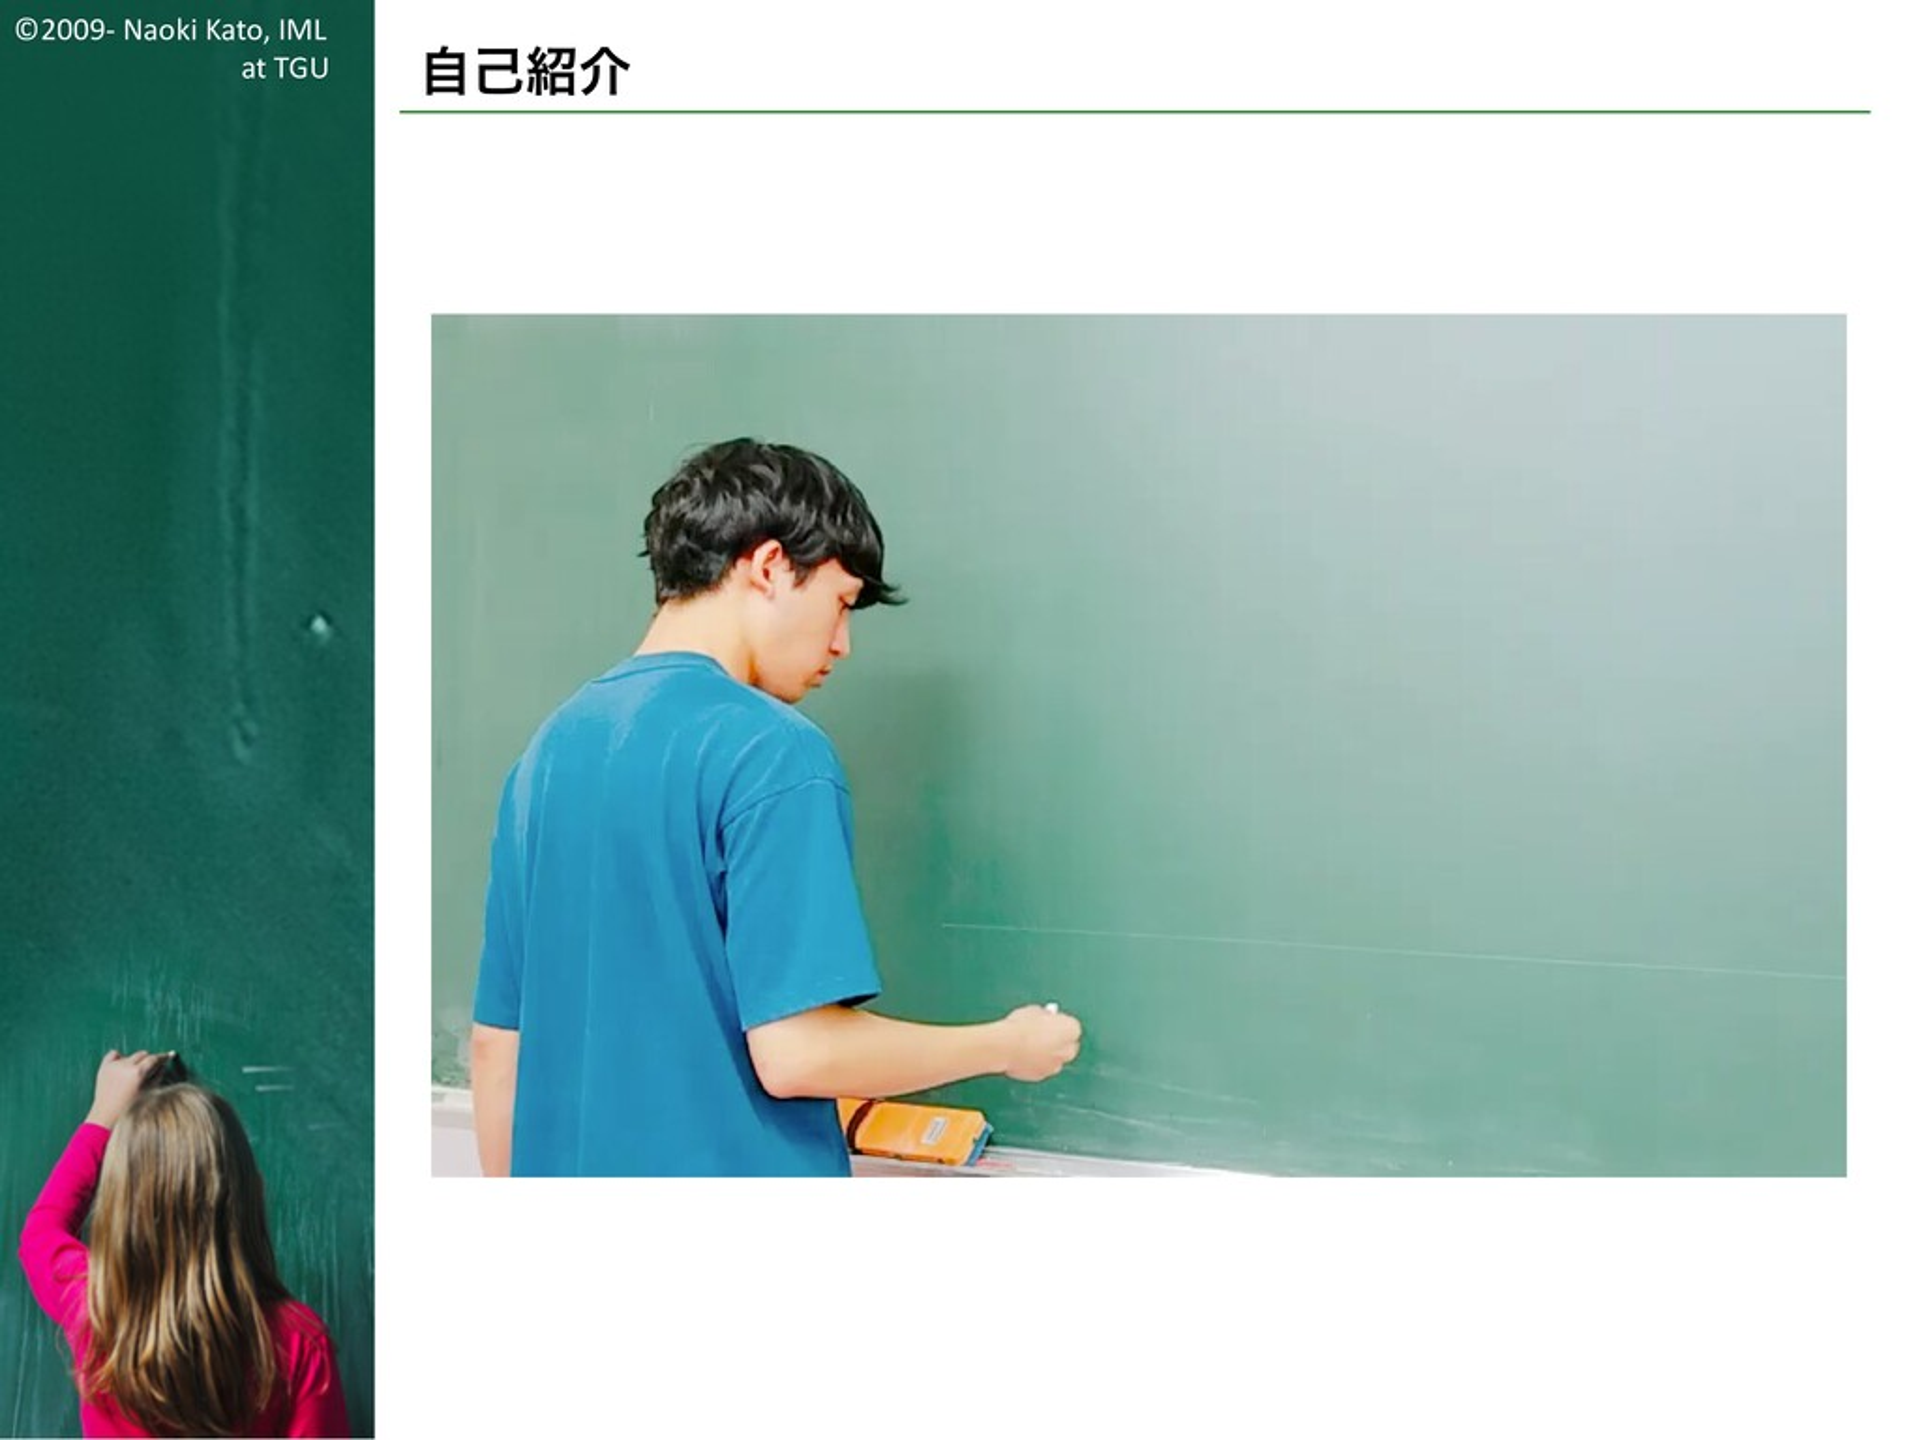 ©2009- Naoki Kato, IML at TGU 自己紹介